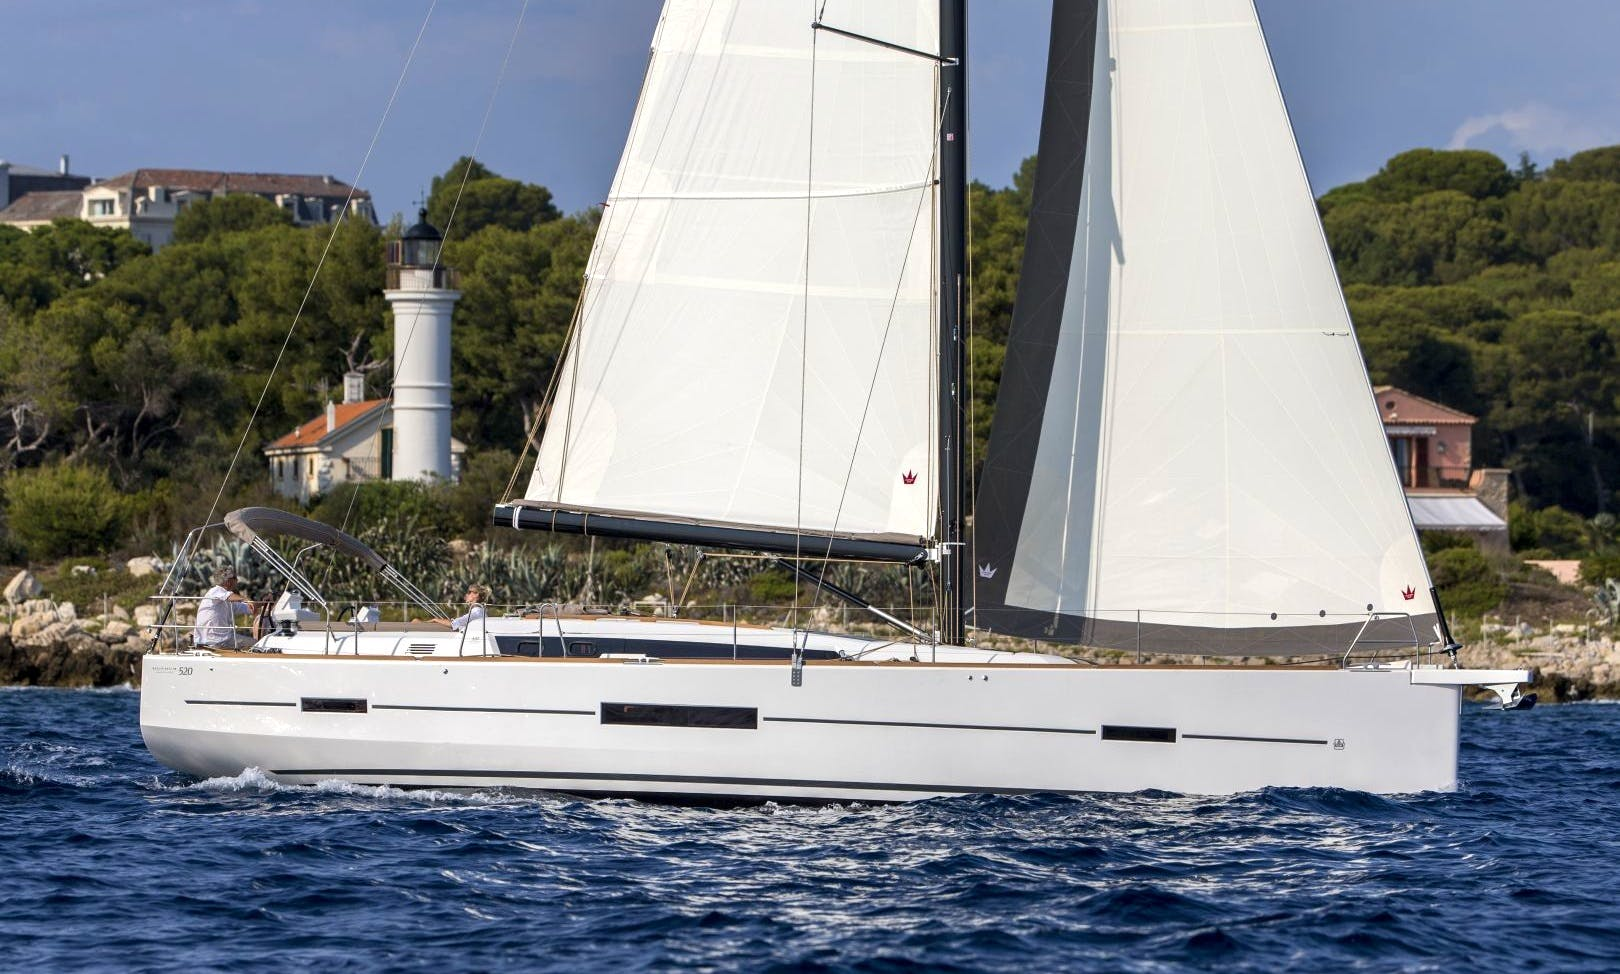 50ft Dufour 520 Cruising Monohull Charter for 8 People in Ljubljana, Slovenia